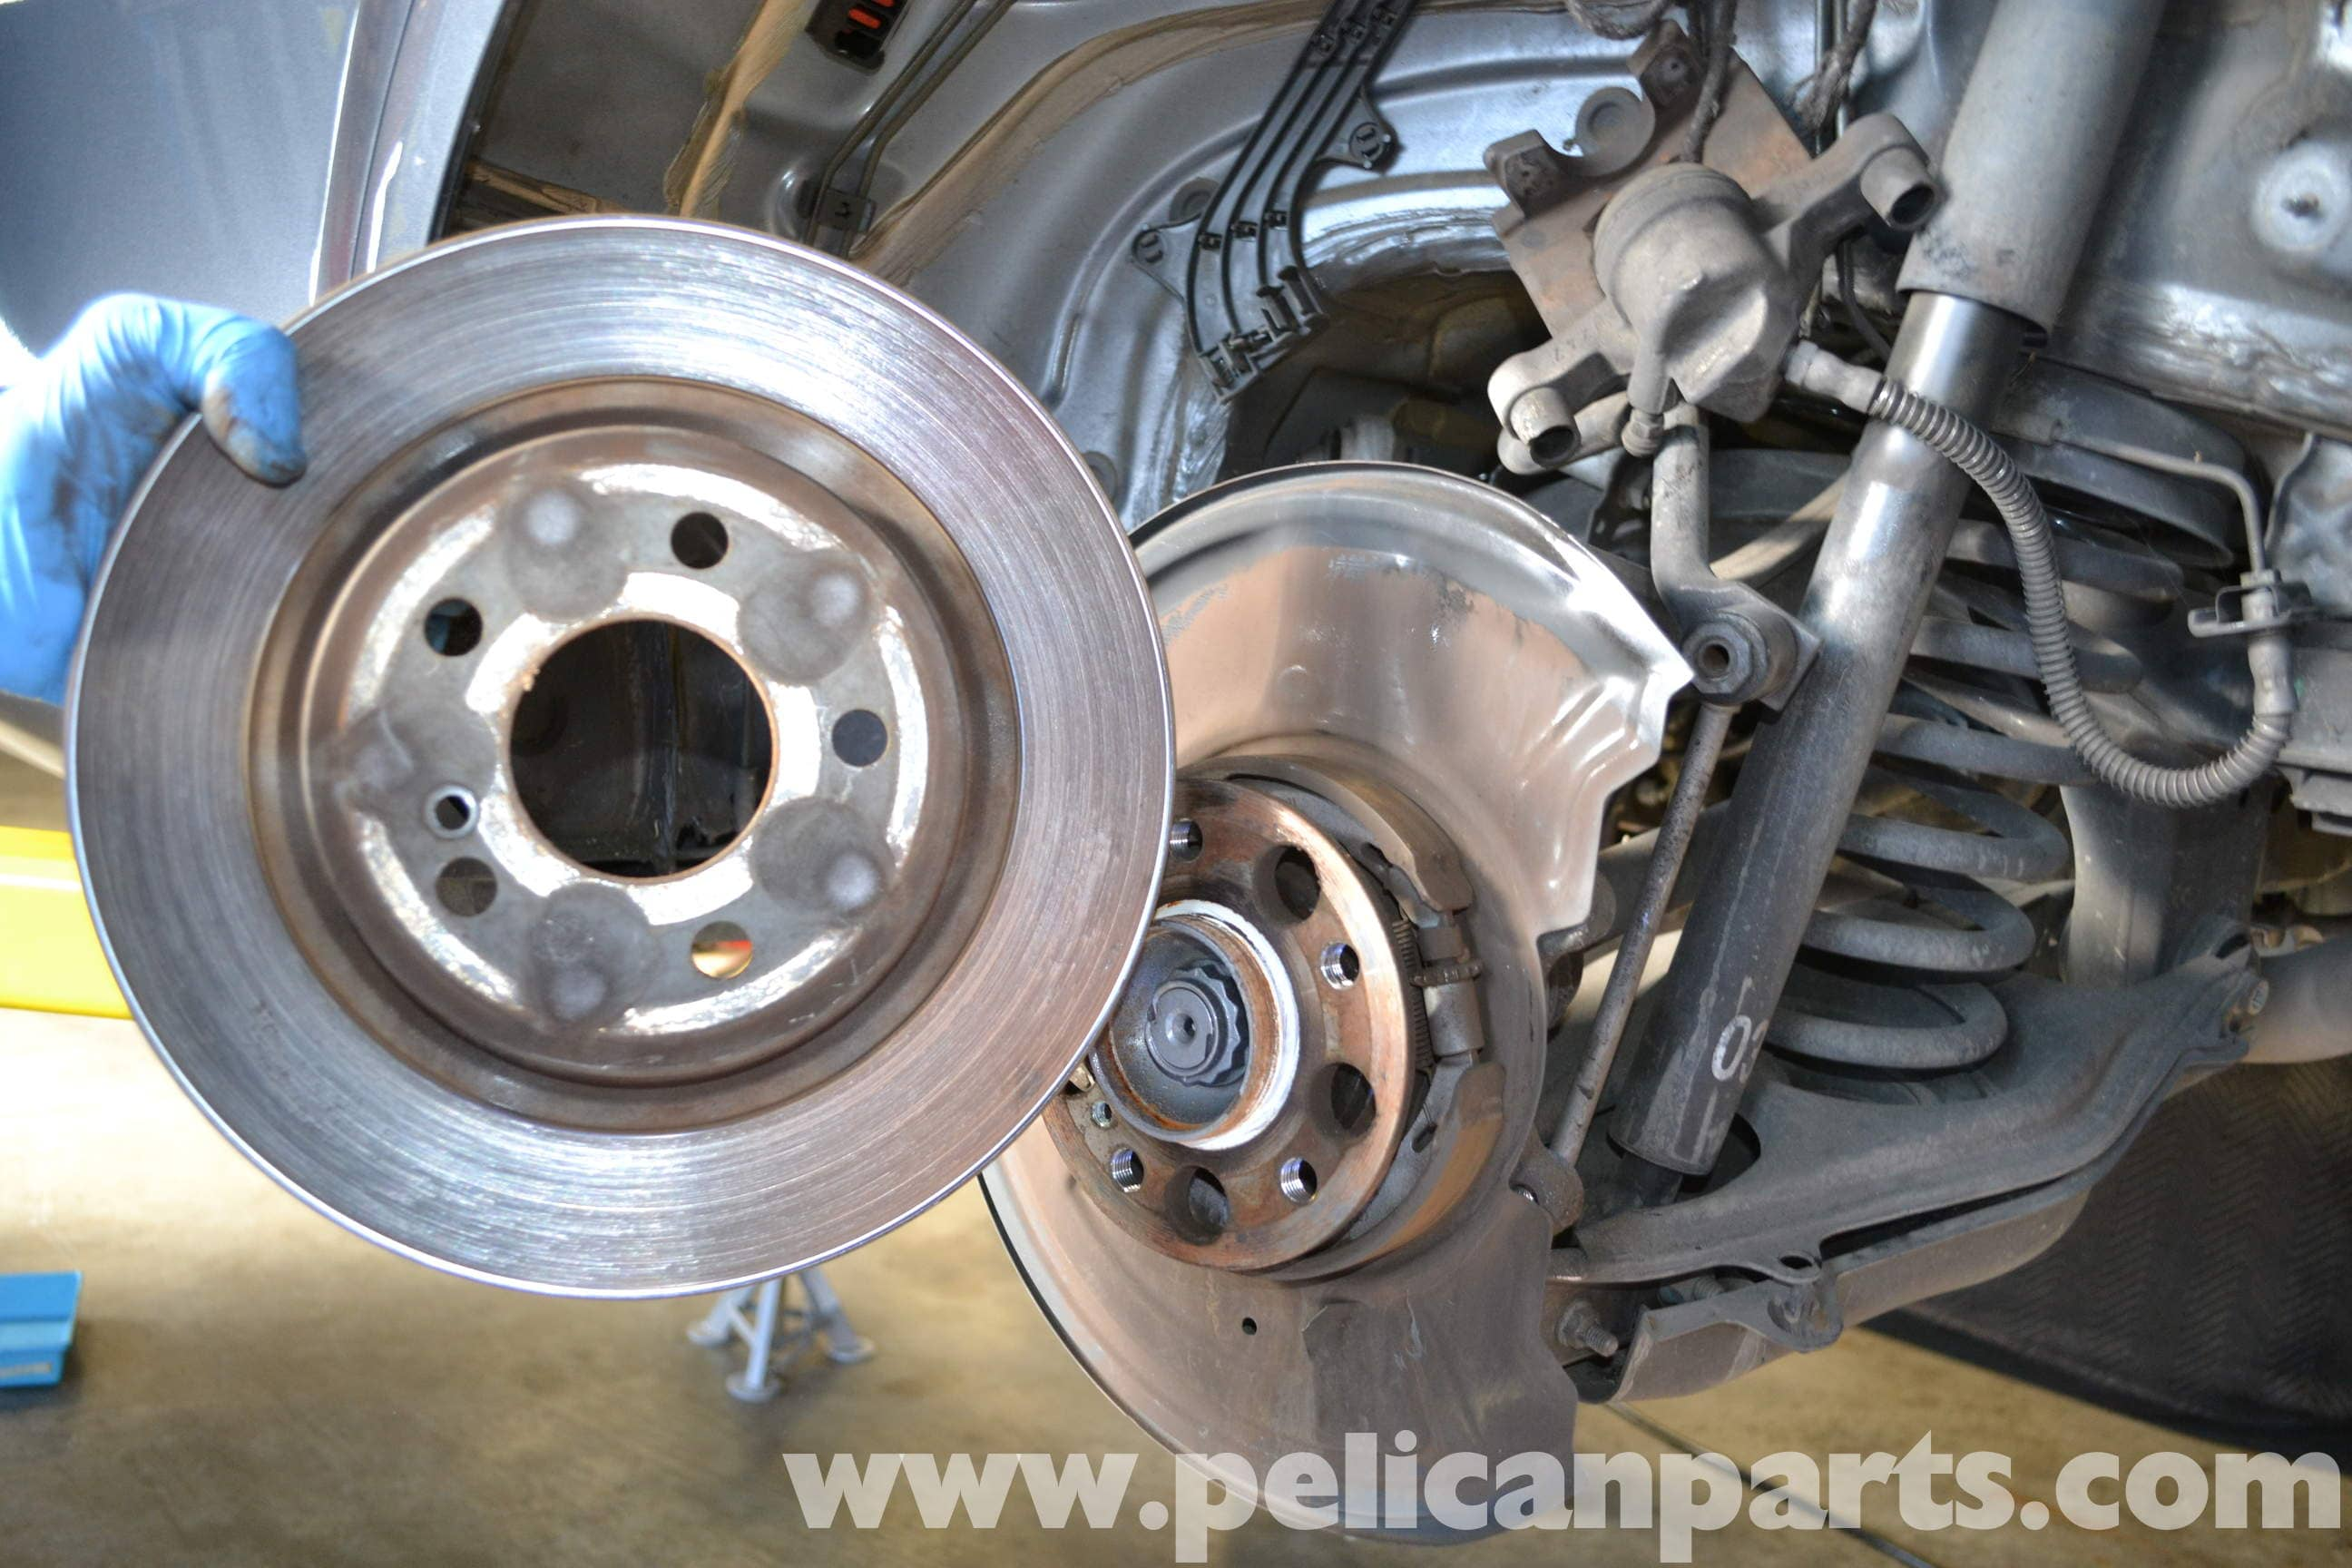 Mercedes benz w204 parking brake shoe replacement 2008 for Replacement parts for mercedes benz